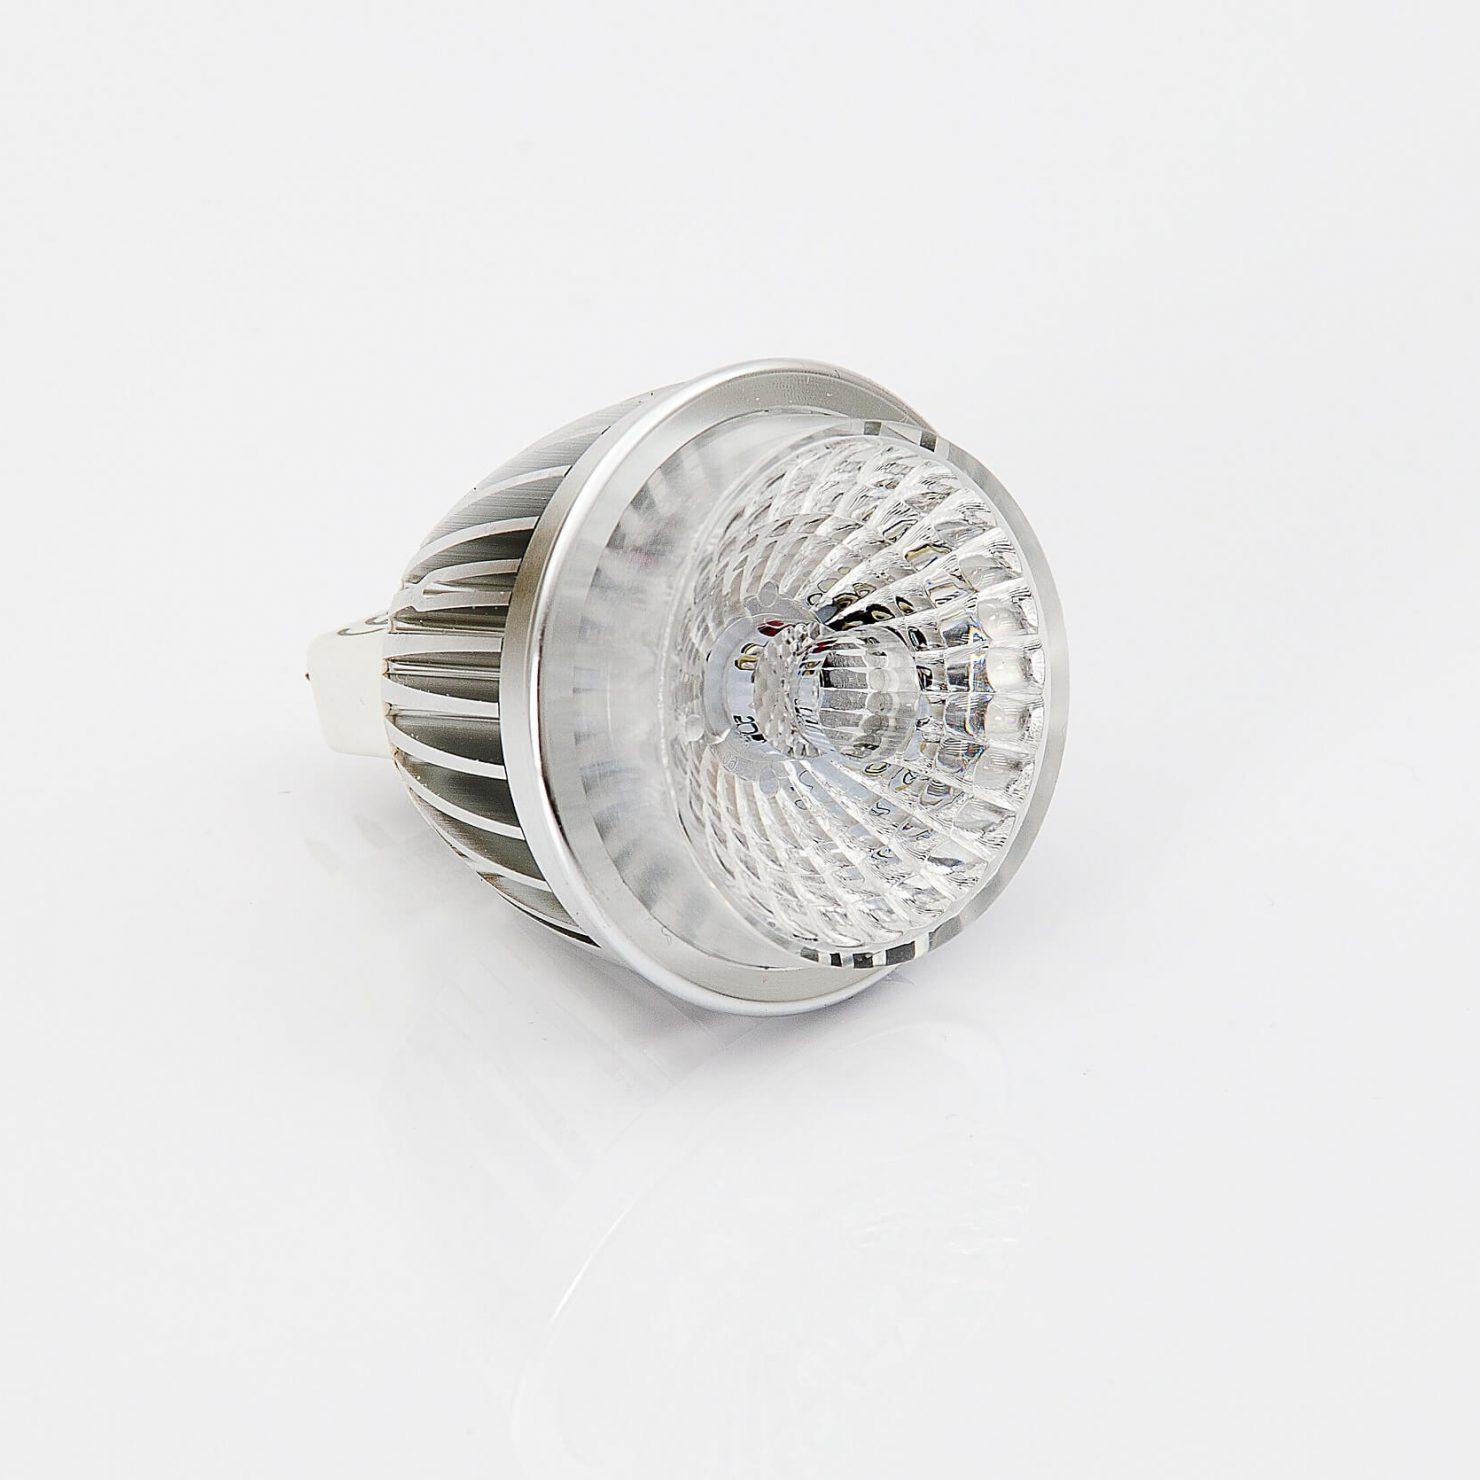 LEDを農業に活かすメリット・デメリットとは?効率的な生産活動を